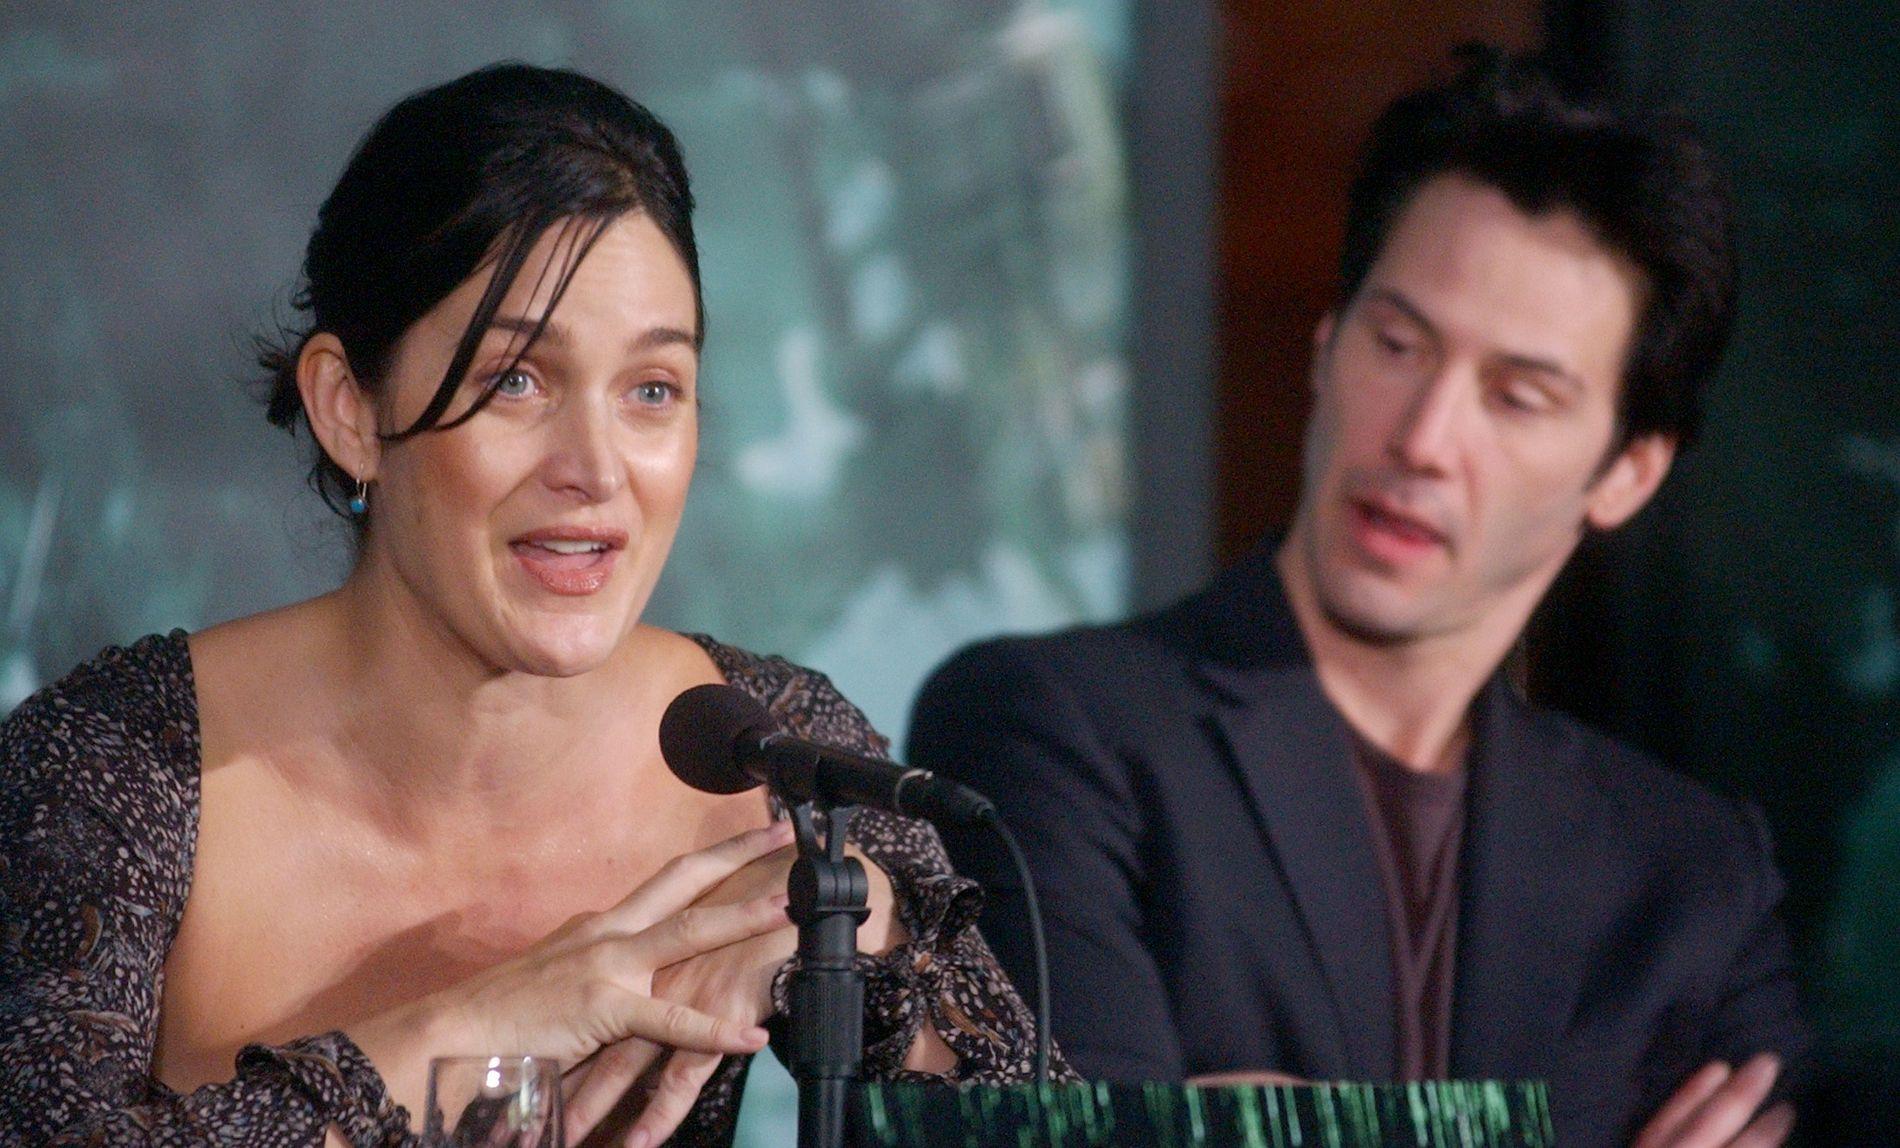 I KALDE NORD: Carrie-Anne Moss, som spilte i «Matrix»-trilogien sammen med blant andre Keanu Reeves, er i Norge for å medvirke i TV-serien «Wisting».